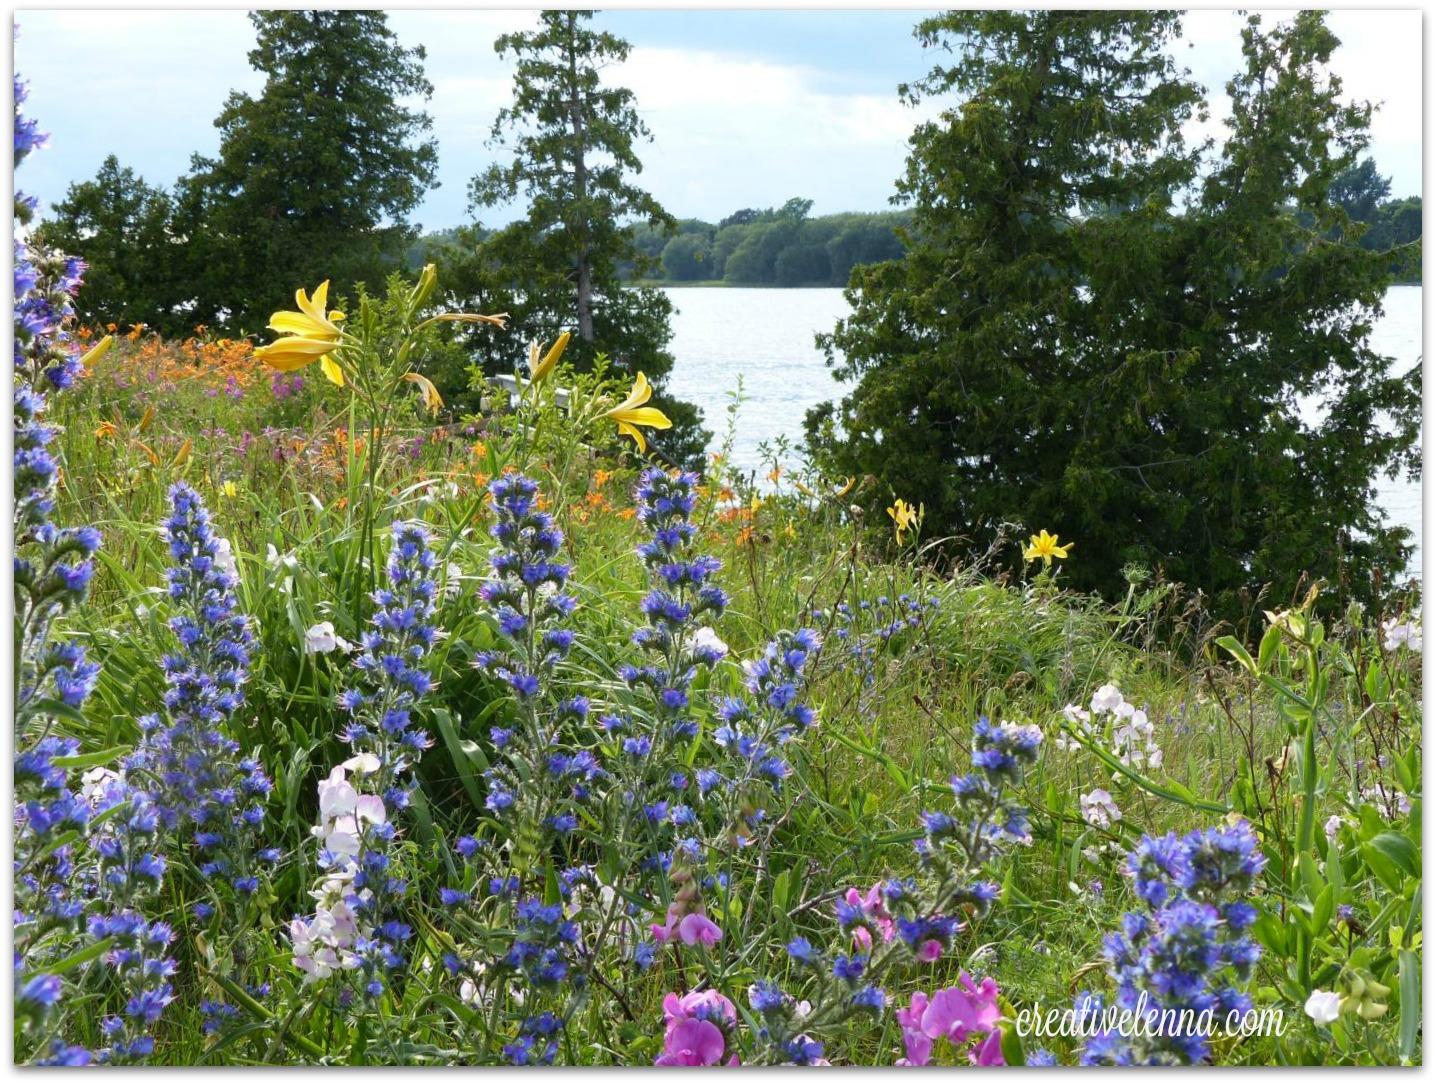 Gorgeous wildflowers